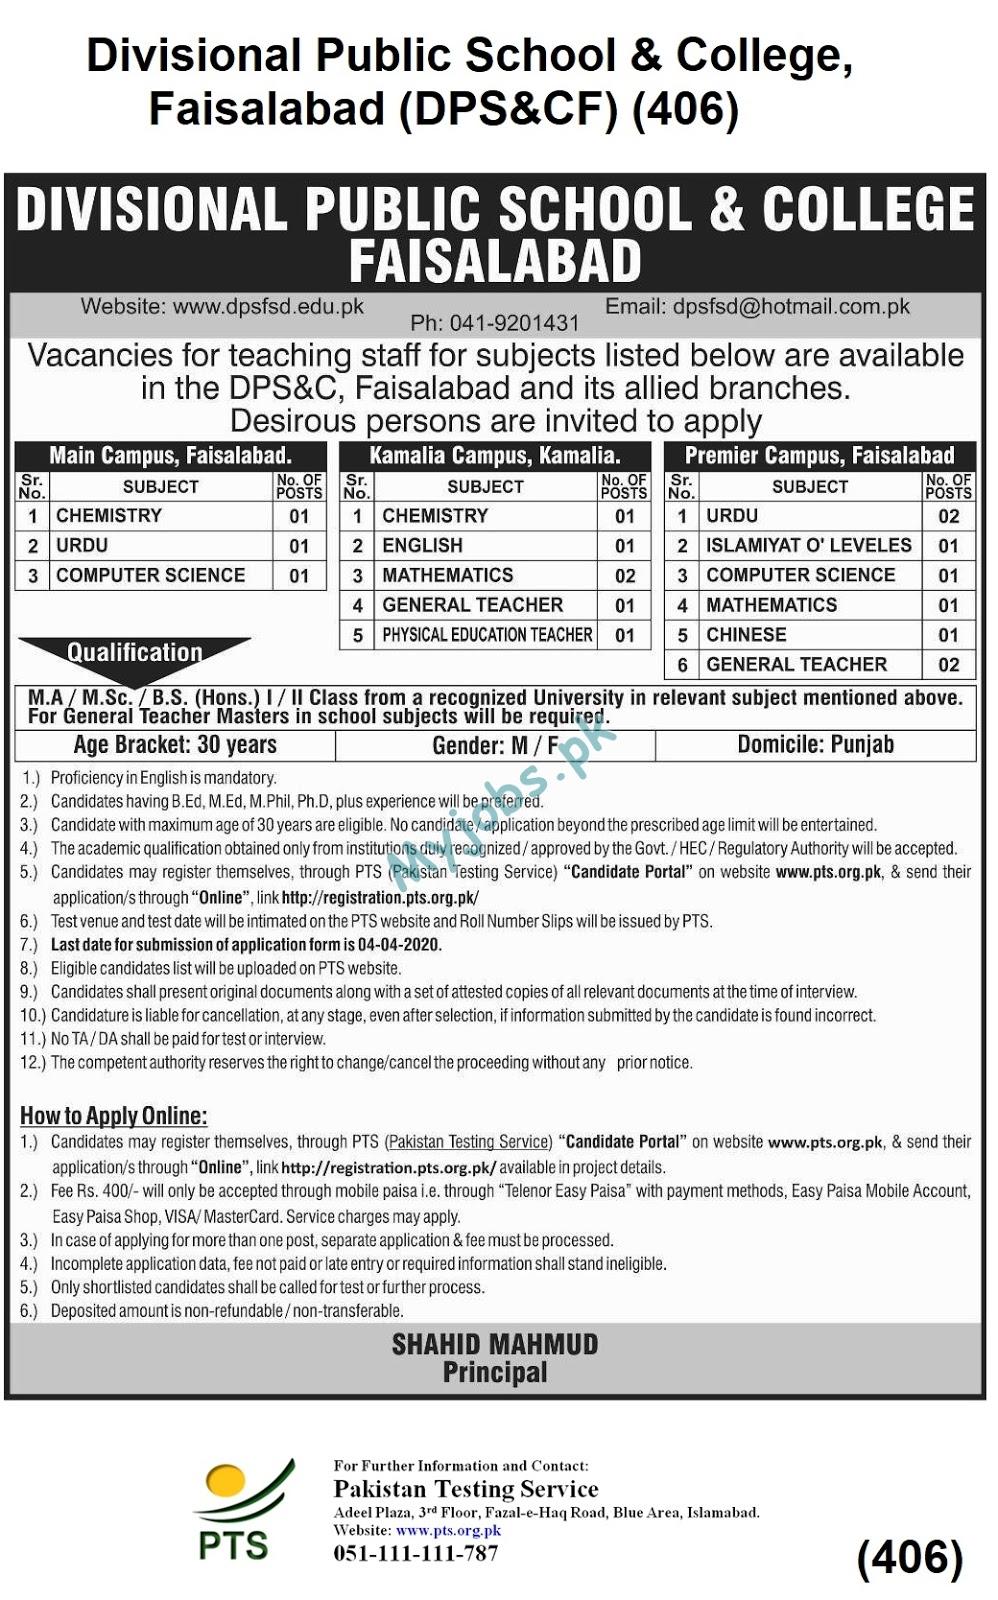 Divisional Public School & College, Faisalabad (DPS&CF) Jobs 2020